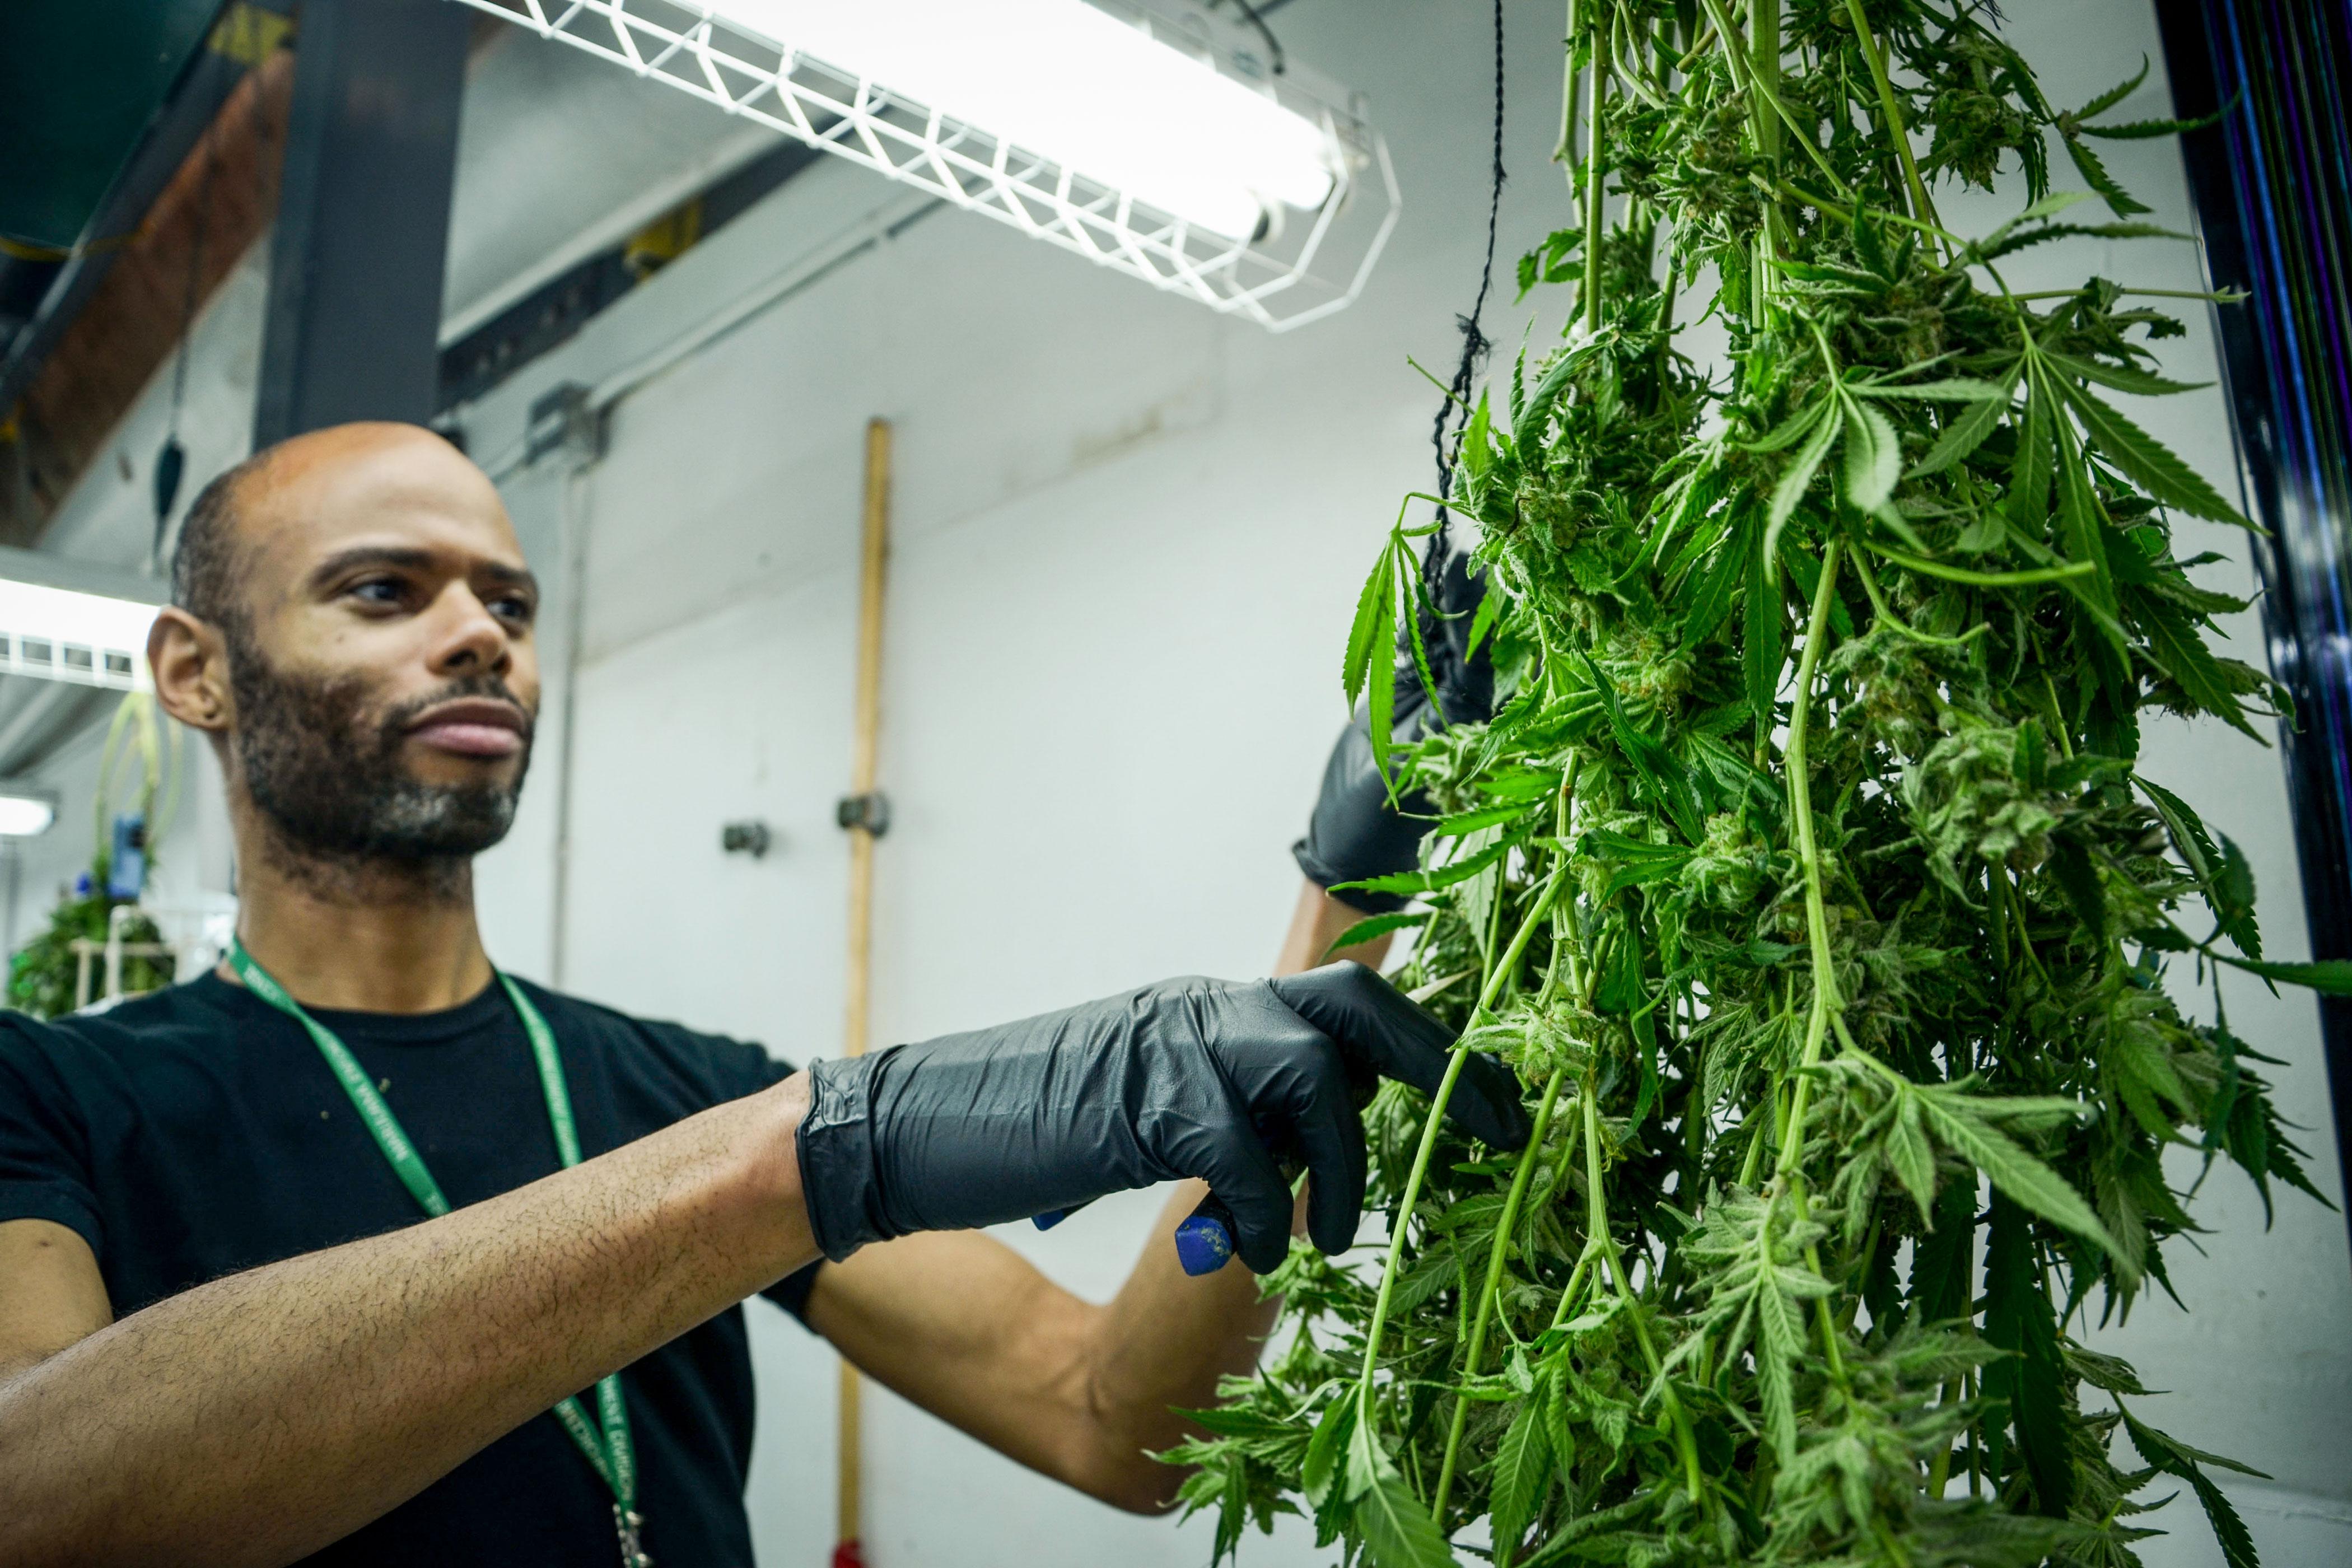 A LivWell employee trims marijuana plants at the company's grow facility in Denver, Colo.